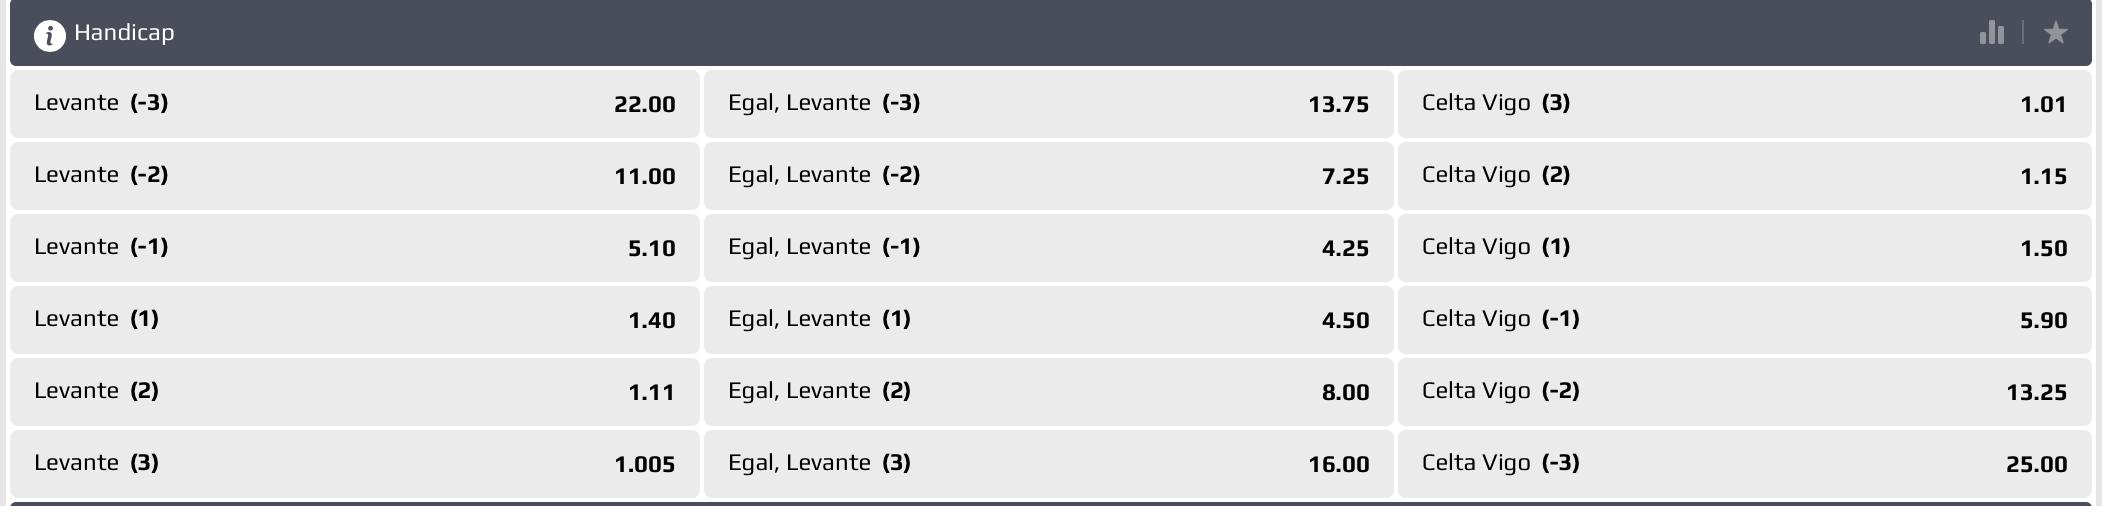 Levante Celta Vigo Cote 26102020